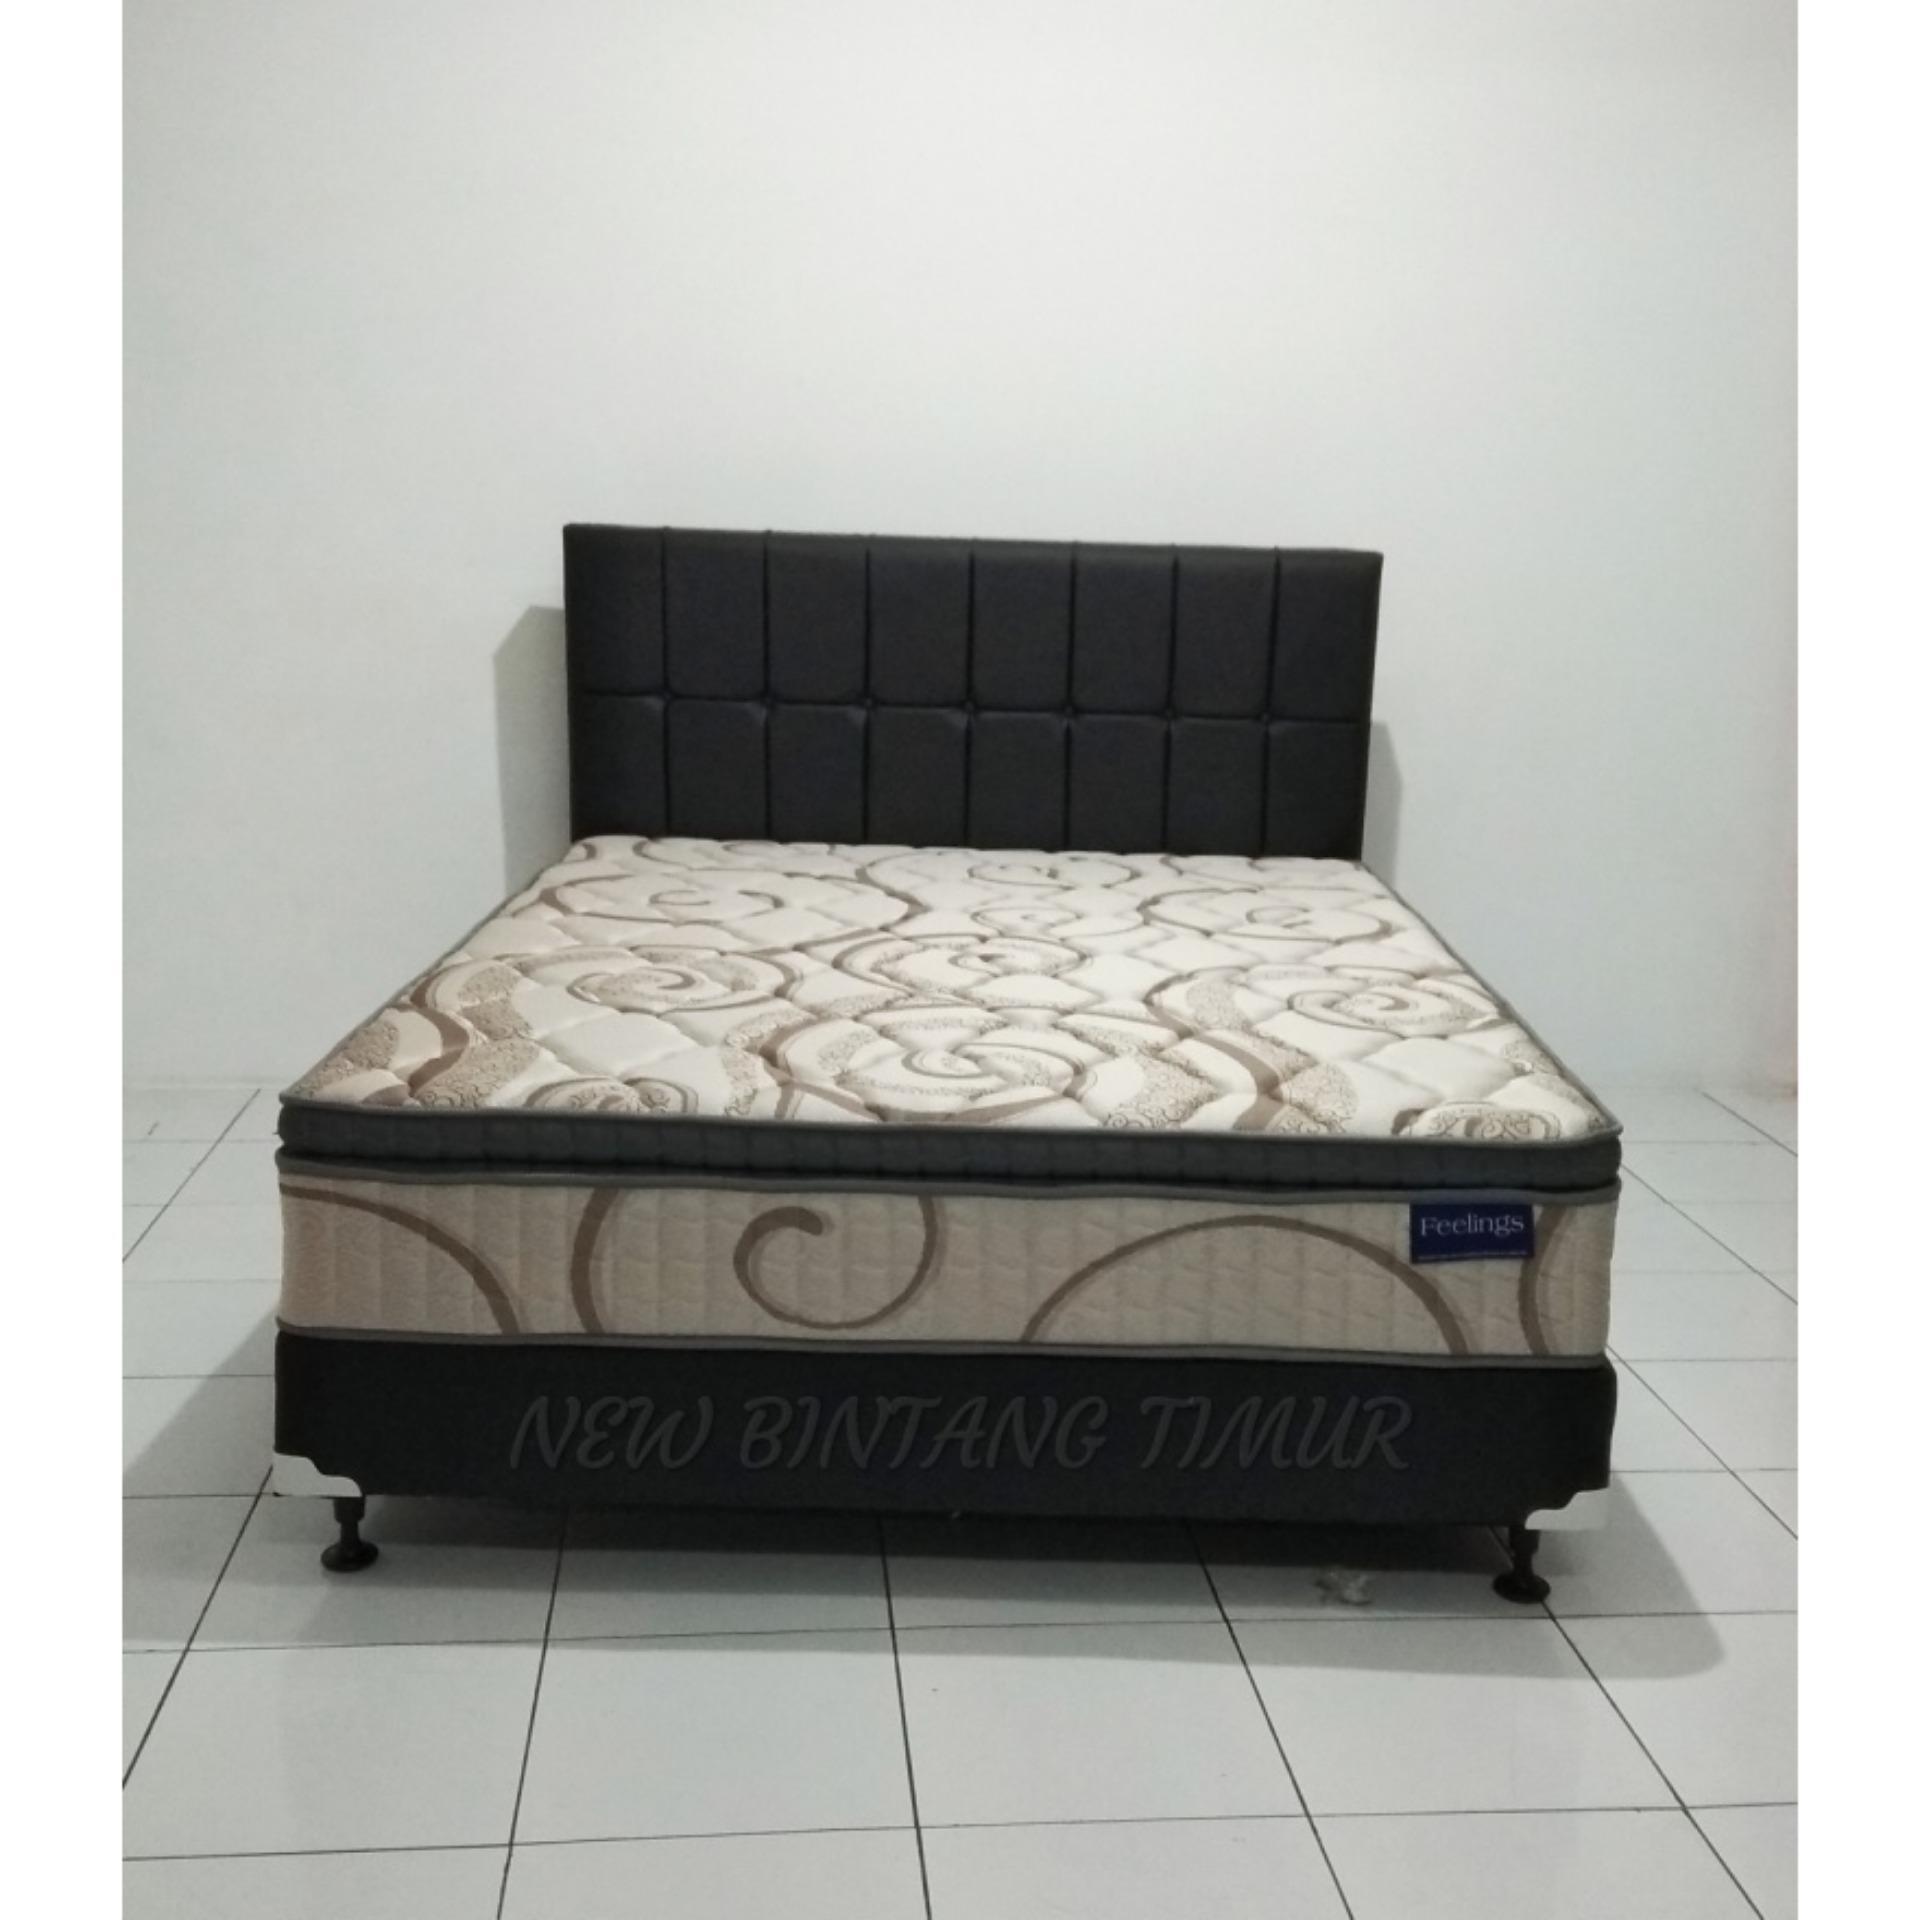 Spring Bed Romance Feelings Plush Top 160 x 200 Full Set